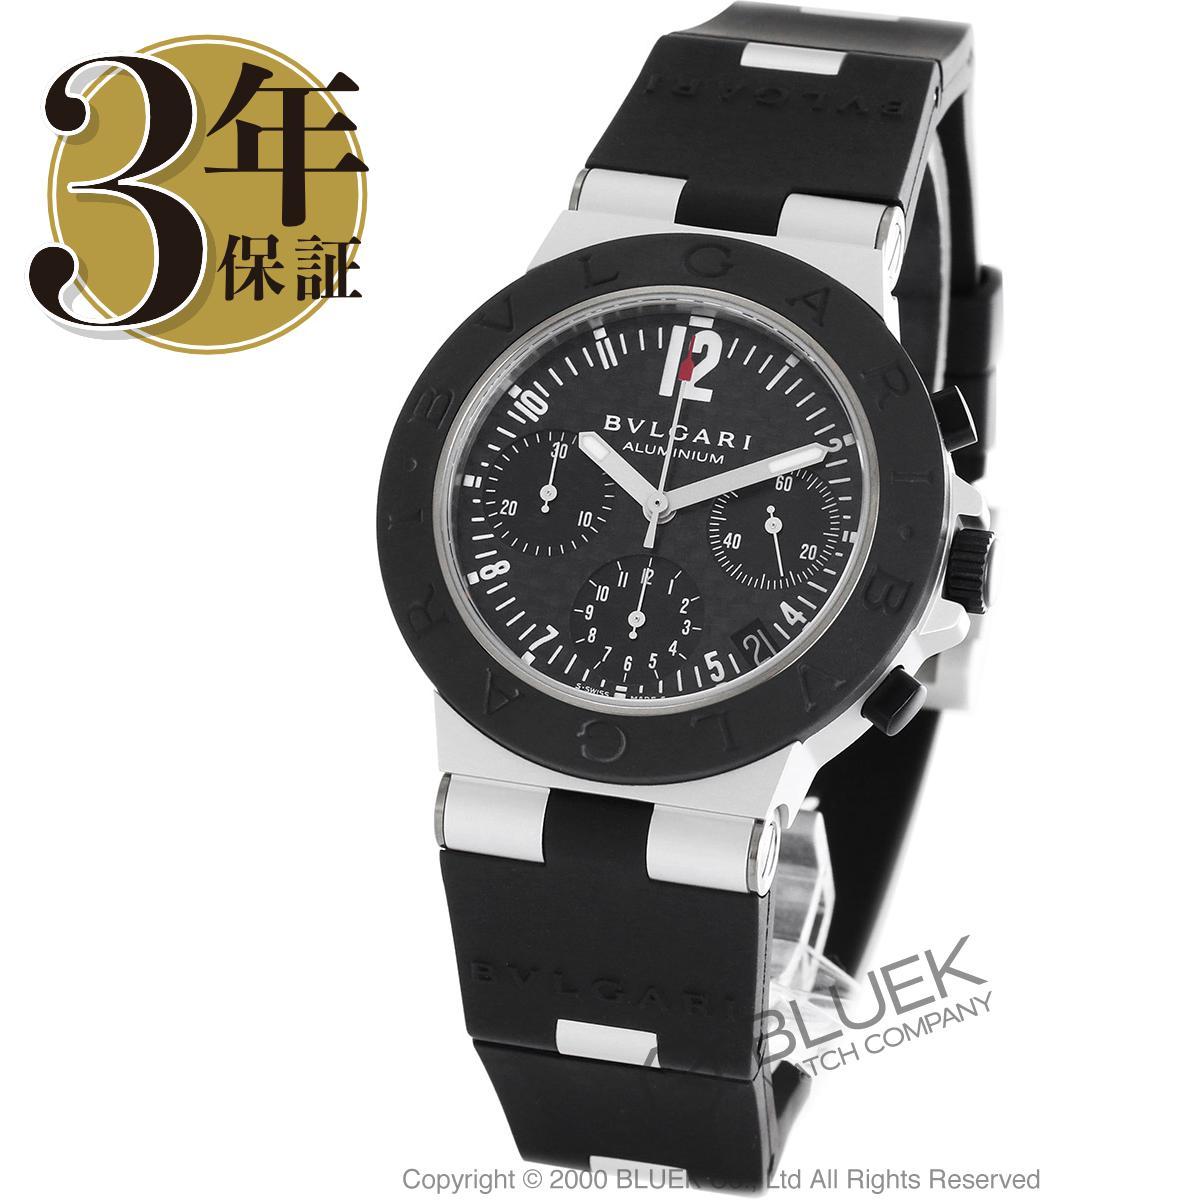 92ac50aa06c6 ブルガリ ディアゴノ アルミニウム クロノグラフ 腕時計 メンズ BVLGARI AC38BTAVD_8 [送料無料][対応][ブルガリ ][AC38BTAVD][BVLGARI][時計][新品]